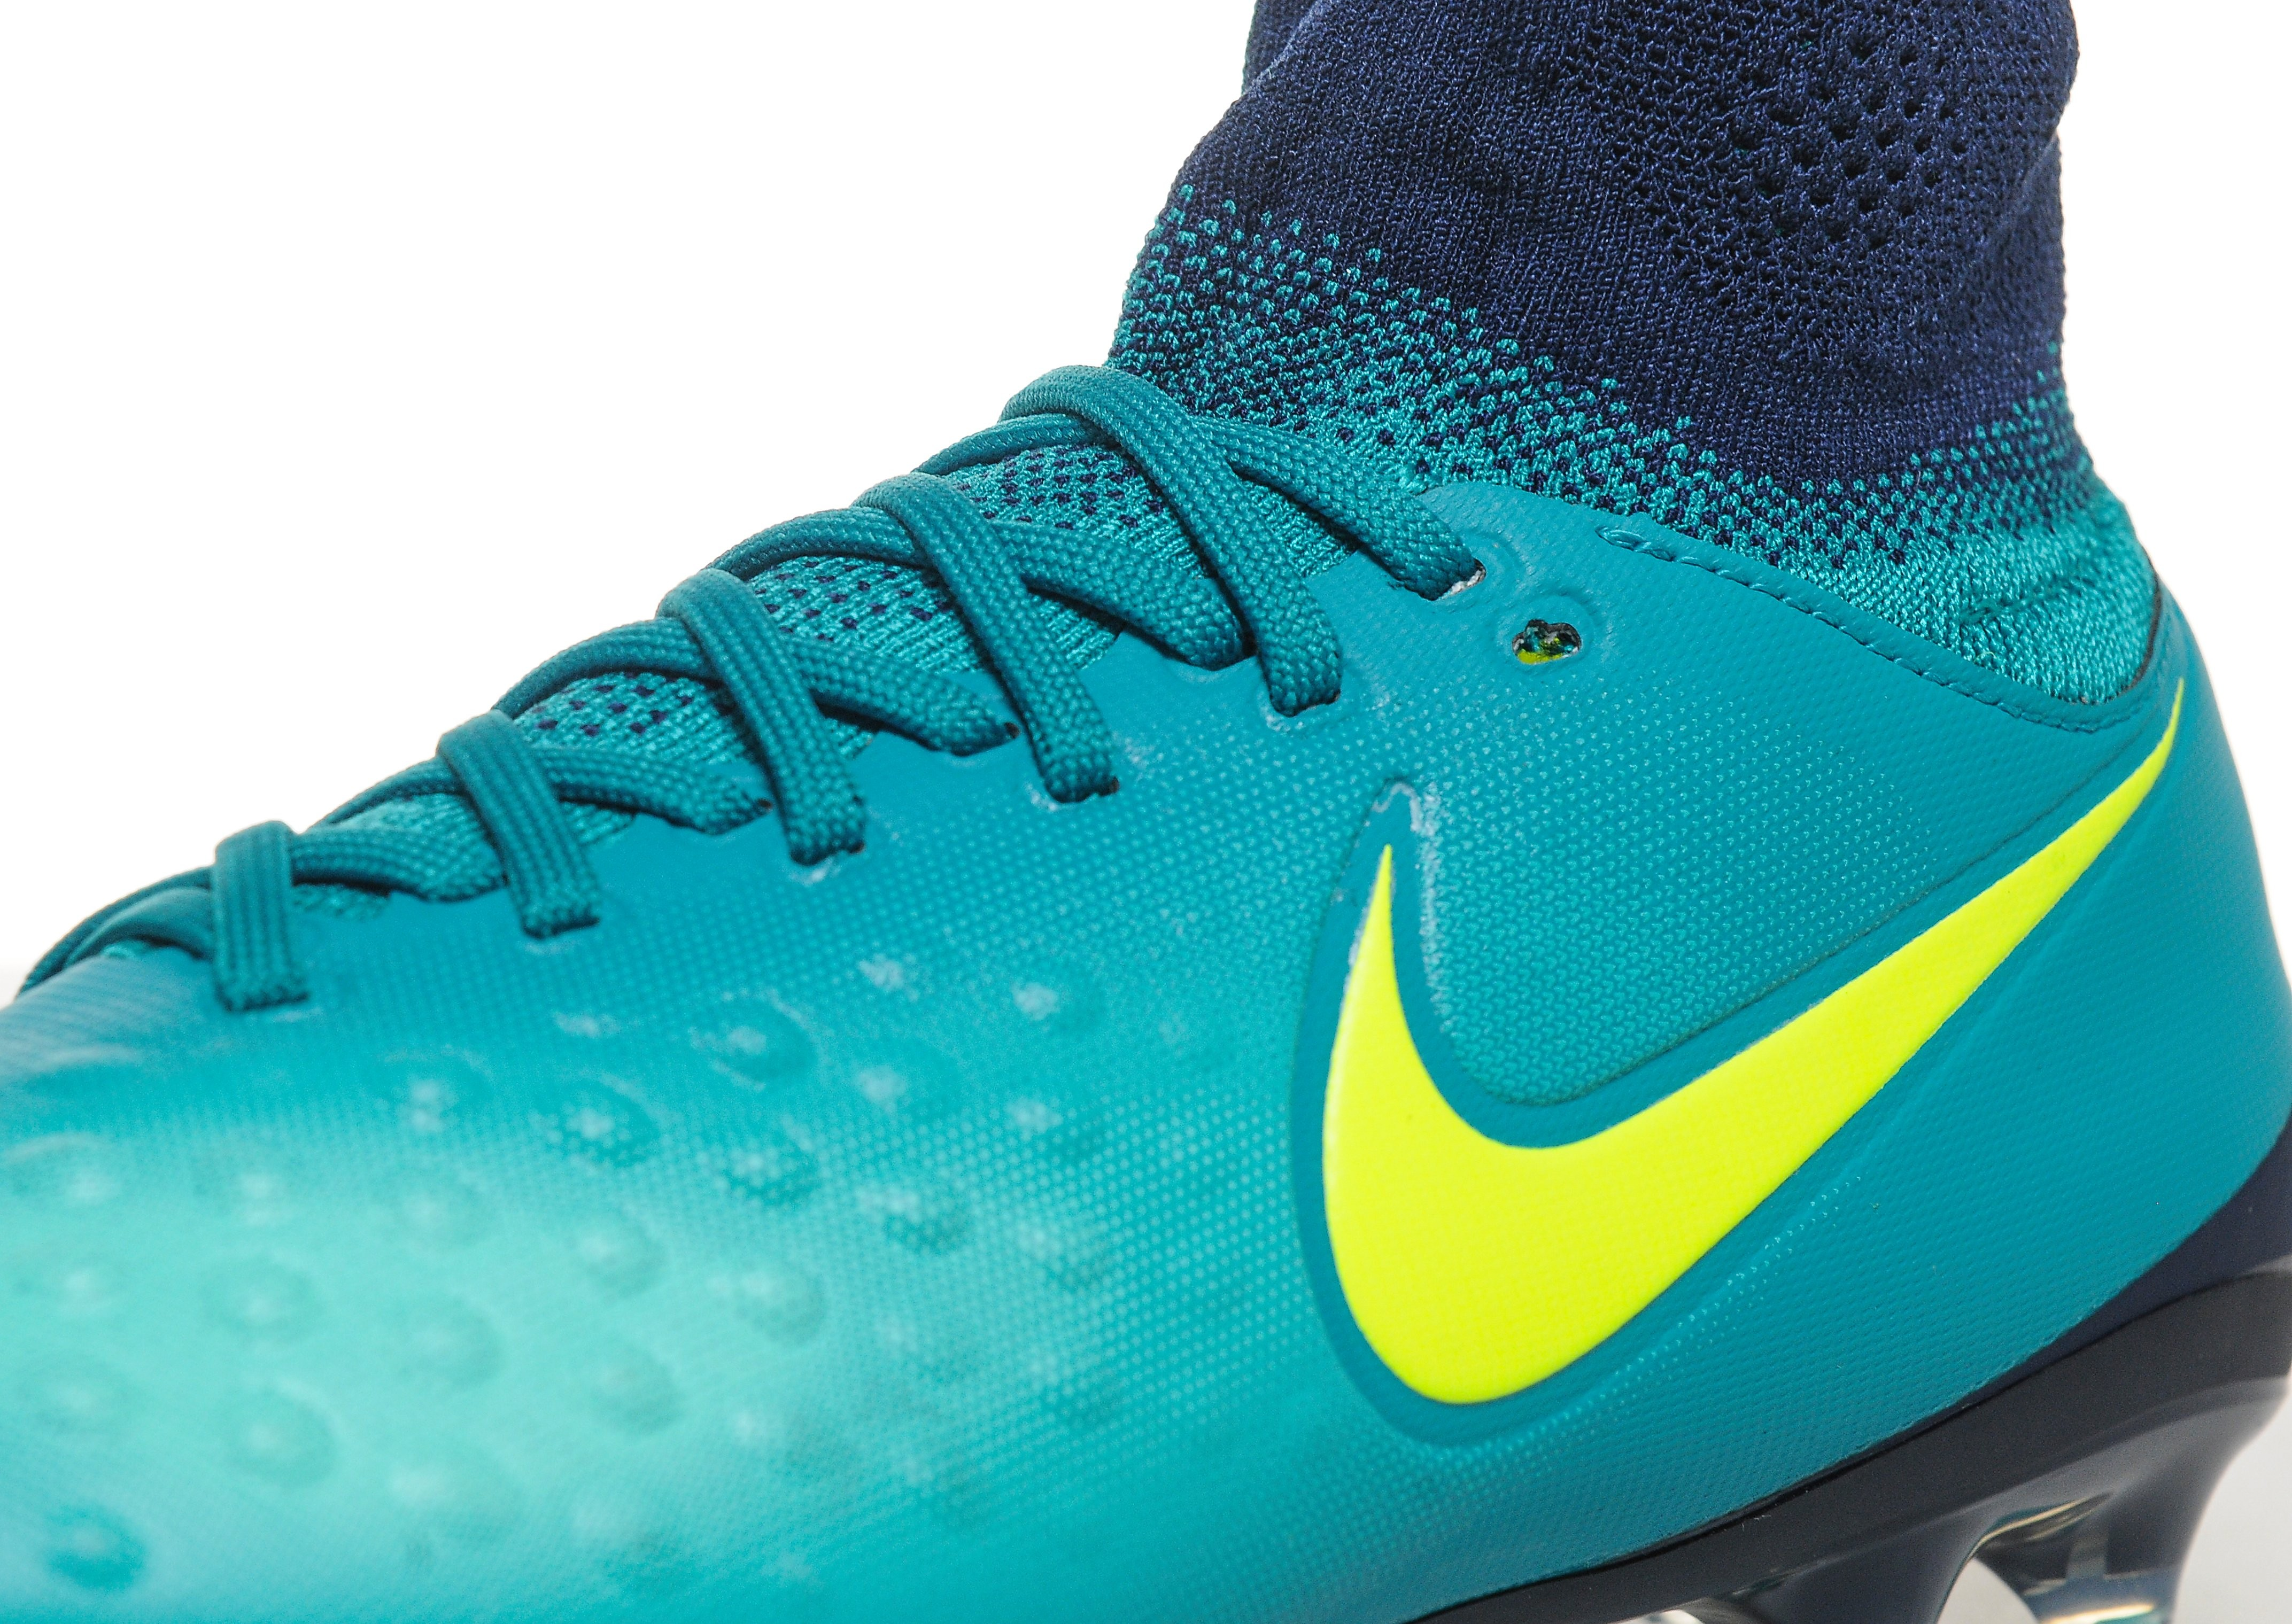 Nike Floodlight Magista Obra II FG Junior